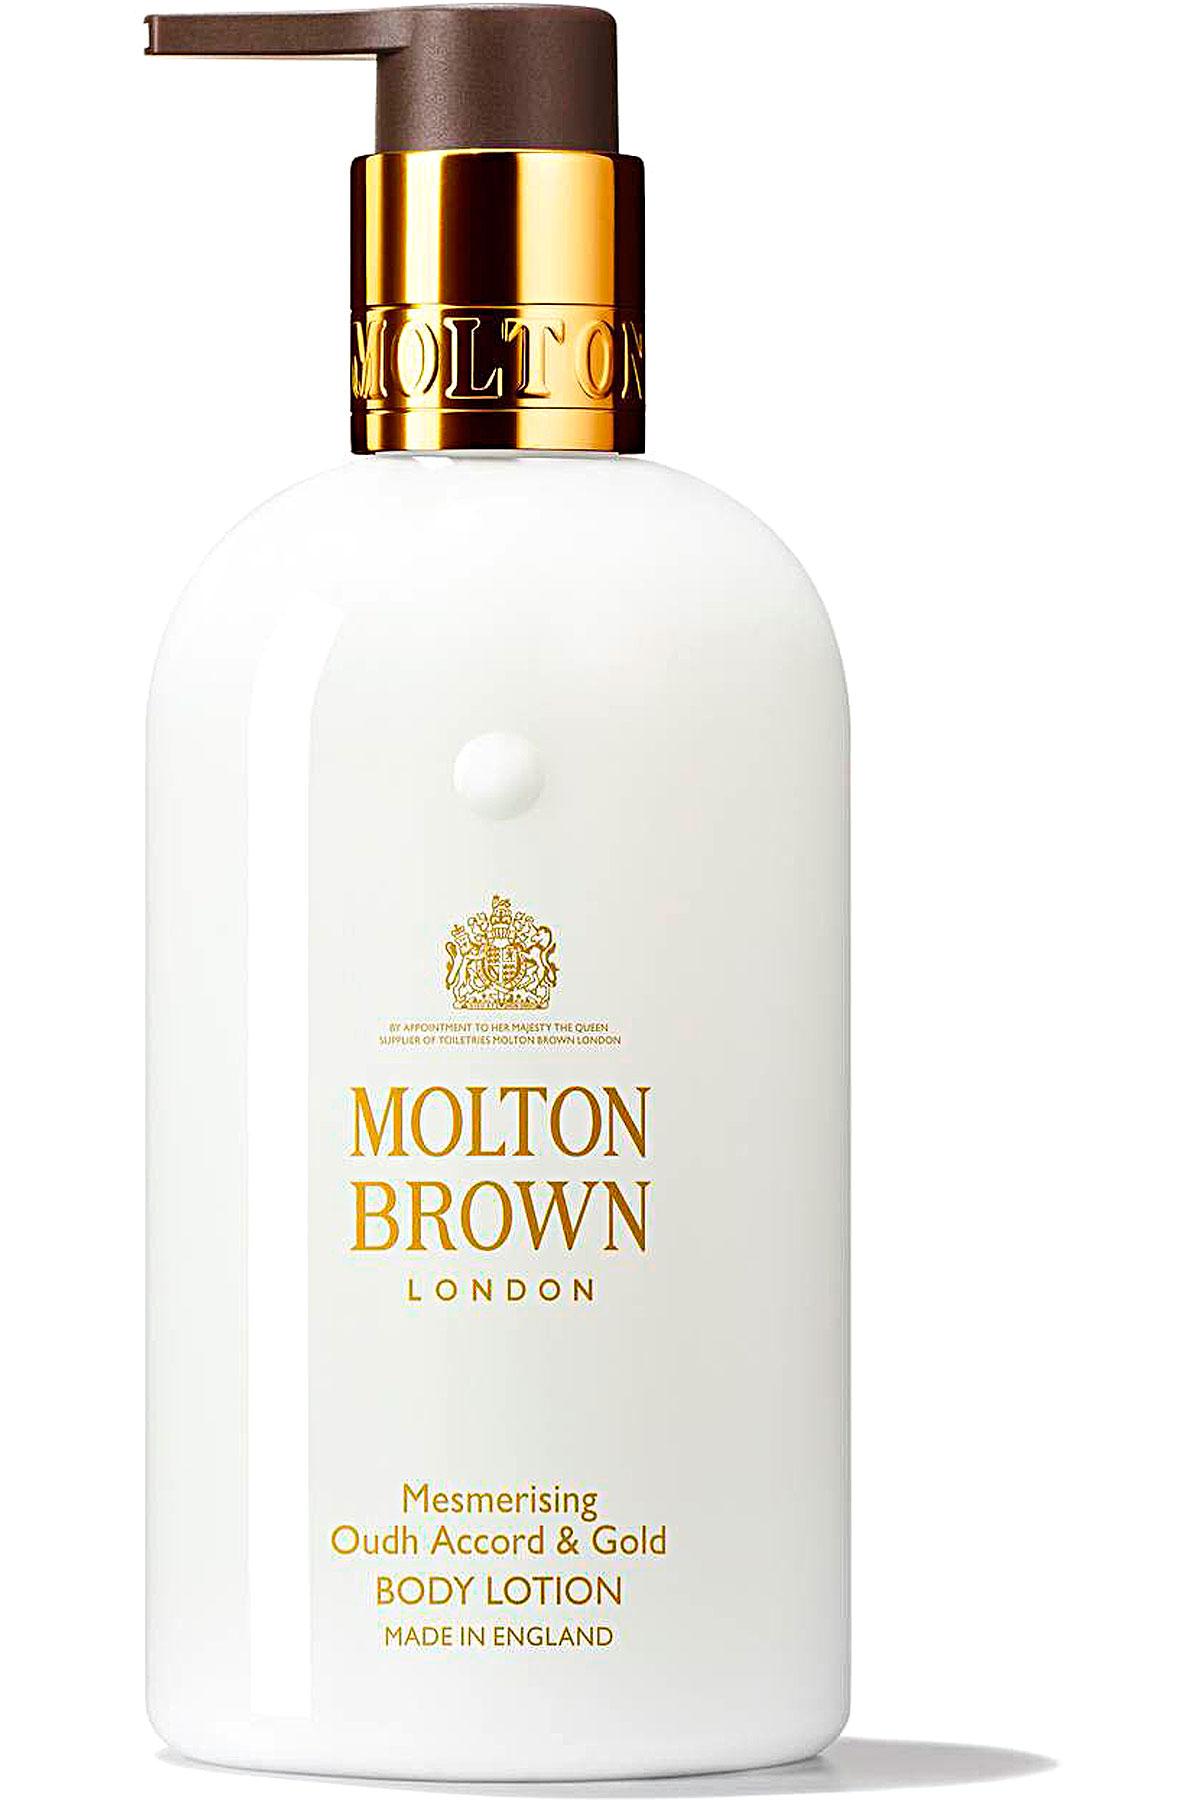 Molton Brown Beauty for Men, Mesmerising Oudh Accord & Gold - Body Lotion - 300 Ml, 2019, 300 ml